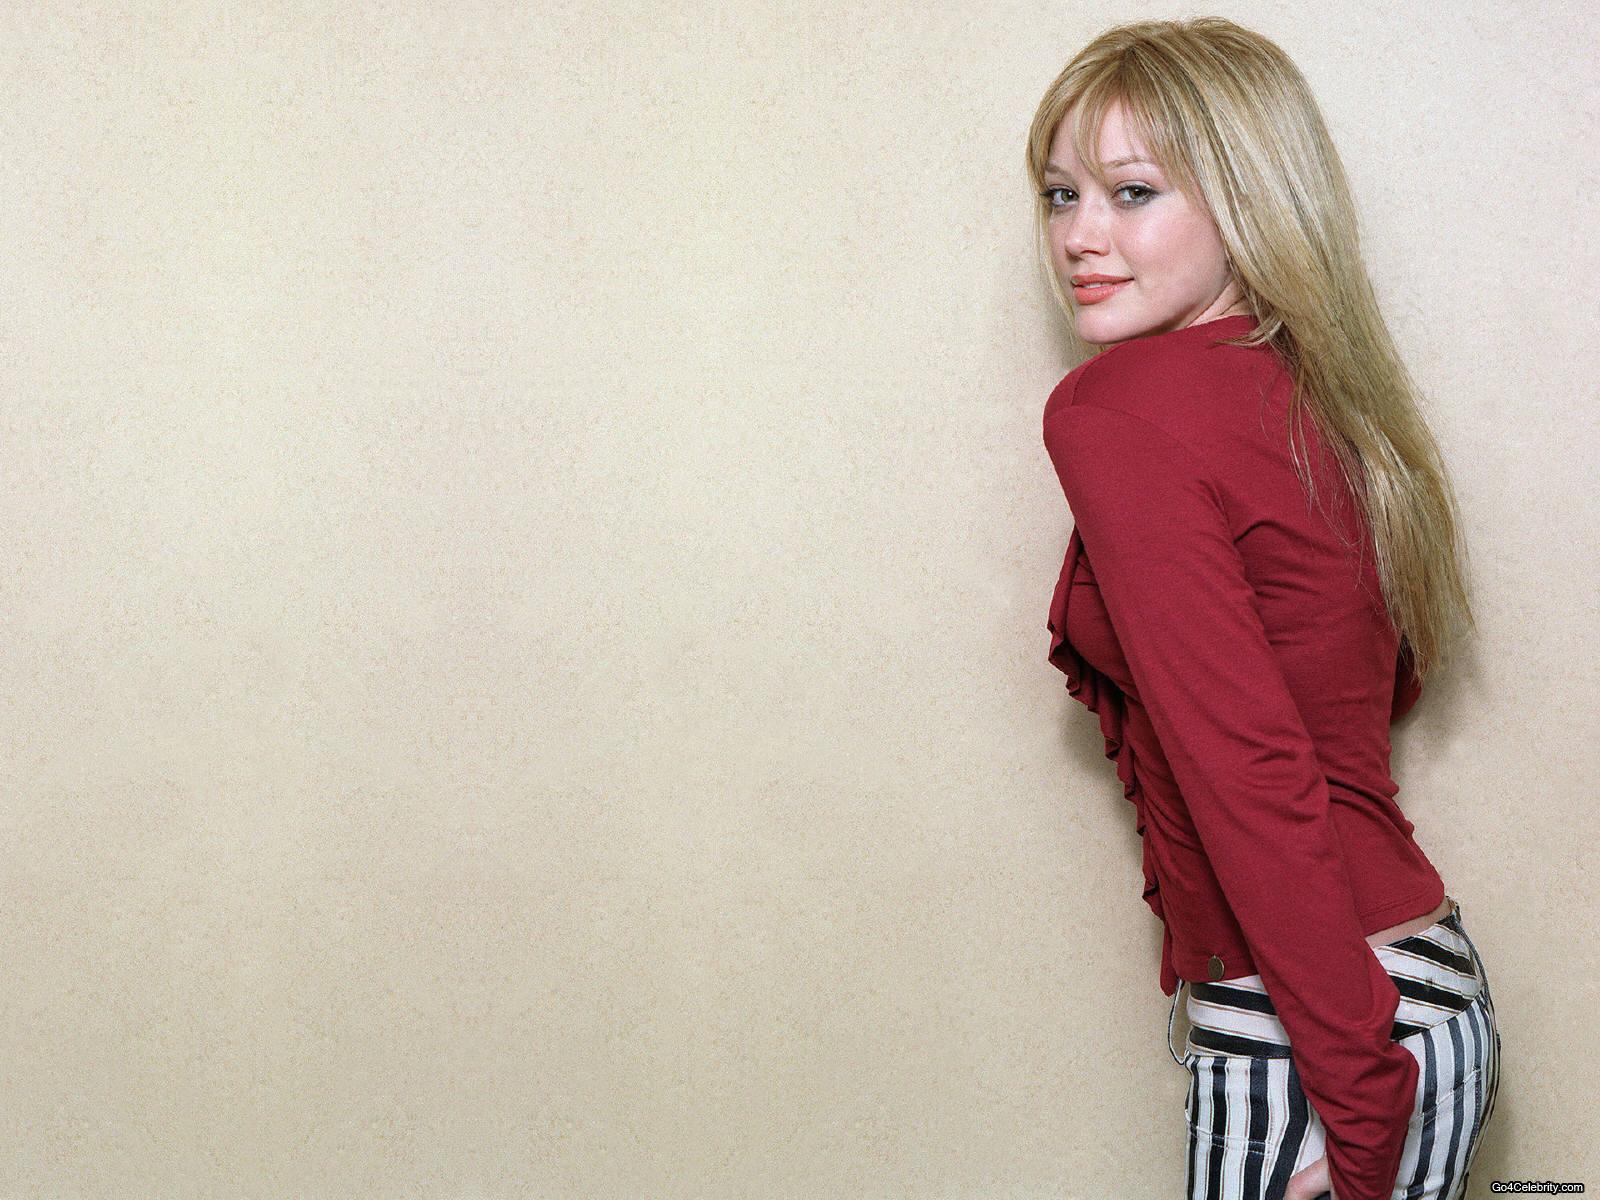 http://2.bp.blogspot.com/-fKezRrVPTIo/ThgWAI0Yn4I/AAAAAAAAEN8/At0xsdJFhHc/s1600/Hilary-Duff-Beauty-Hollywood-Actress-Photo.jpg